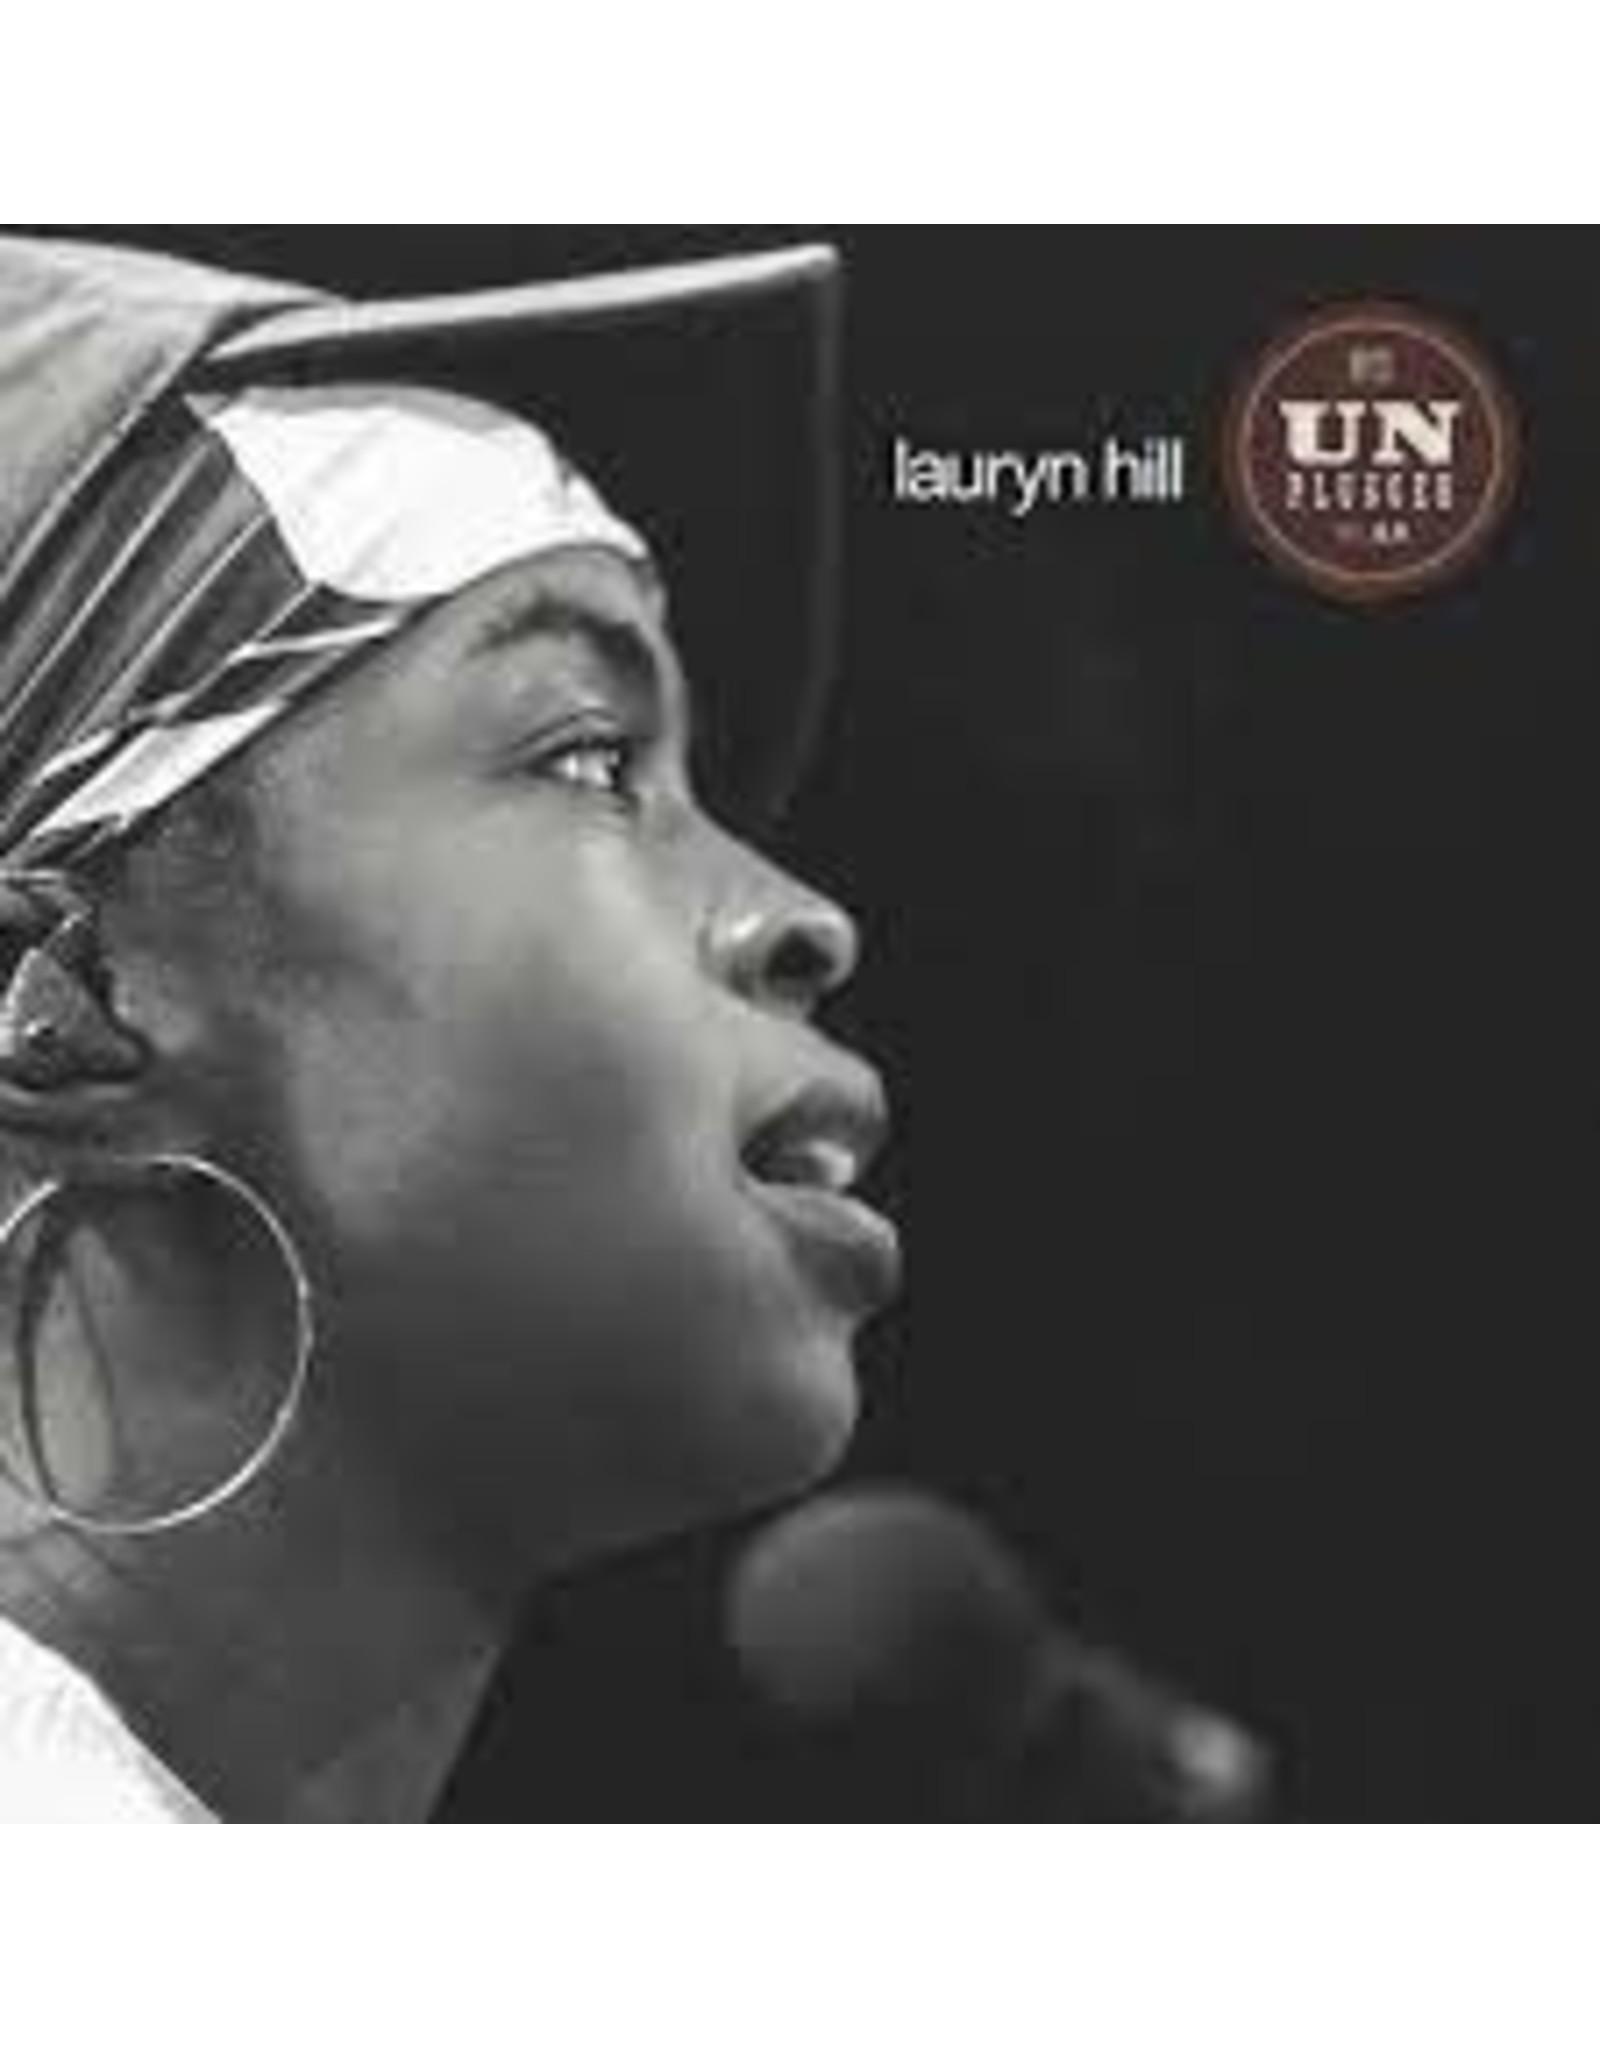 Hill, Lauryn - Unplugged No 2.0 LP